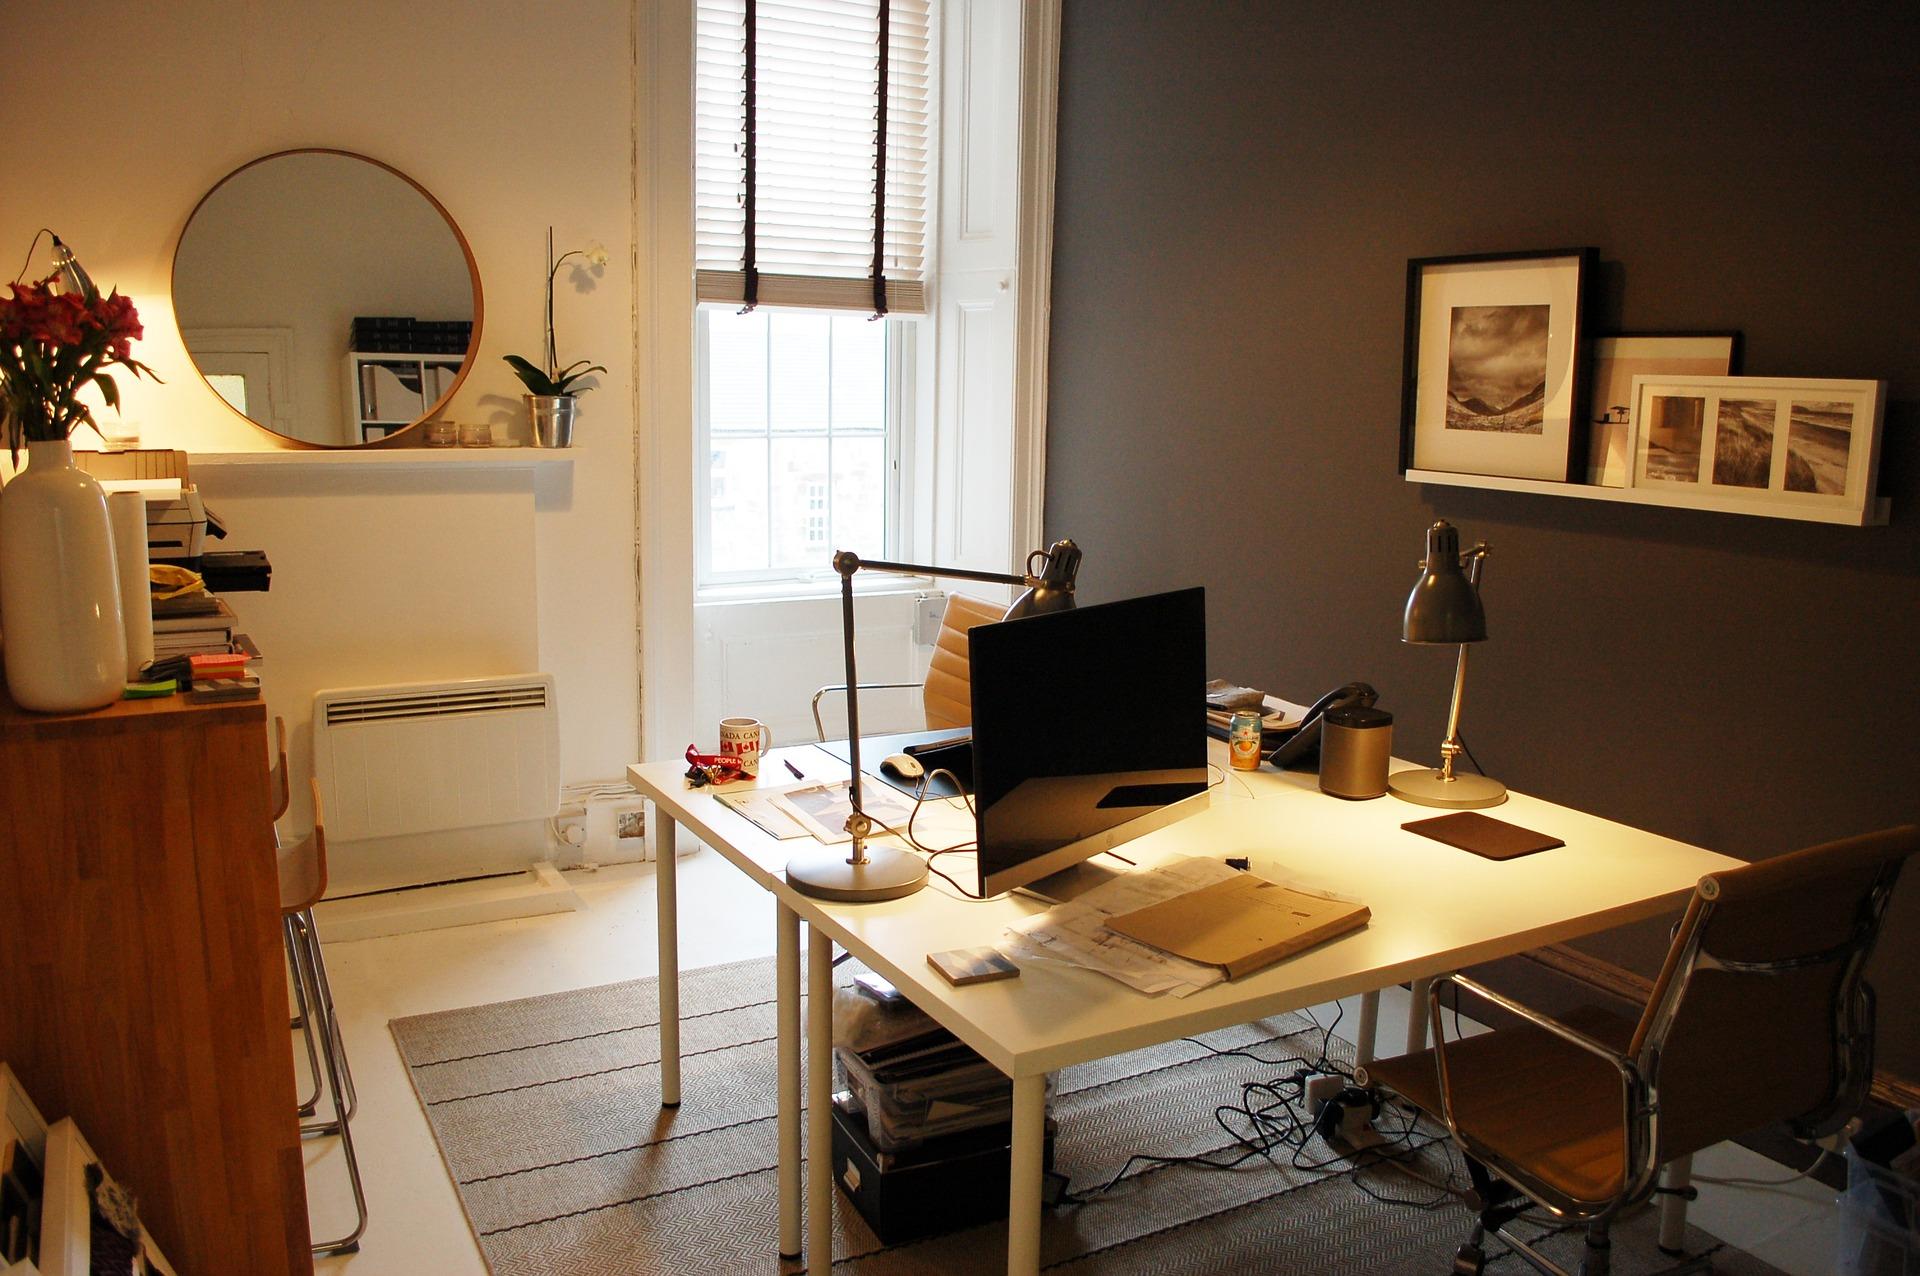 lakás design